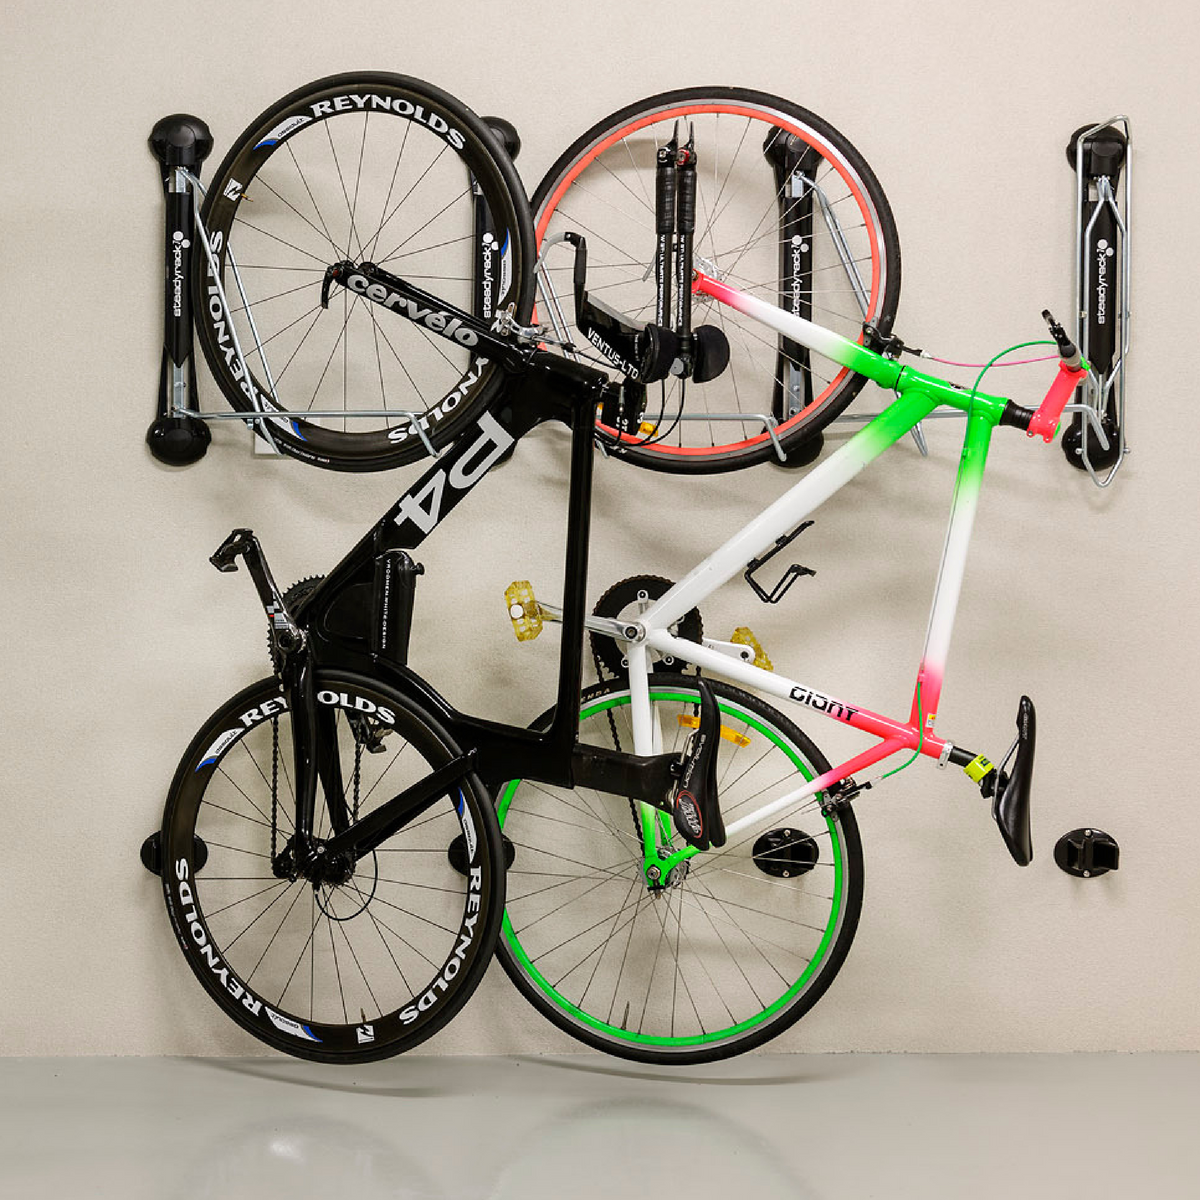 Fit Multiple Bikes In Small Spaces With Our Steadyrack Classic Rack Vertical Bike Rack Indoor Bike Storage Wall Mount Bike Rack